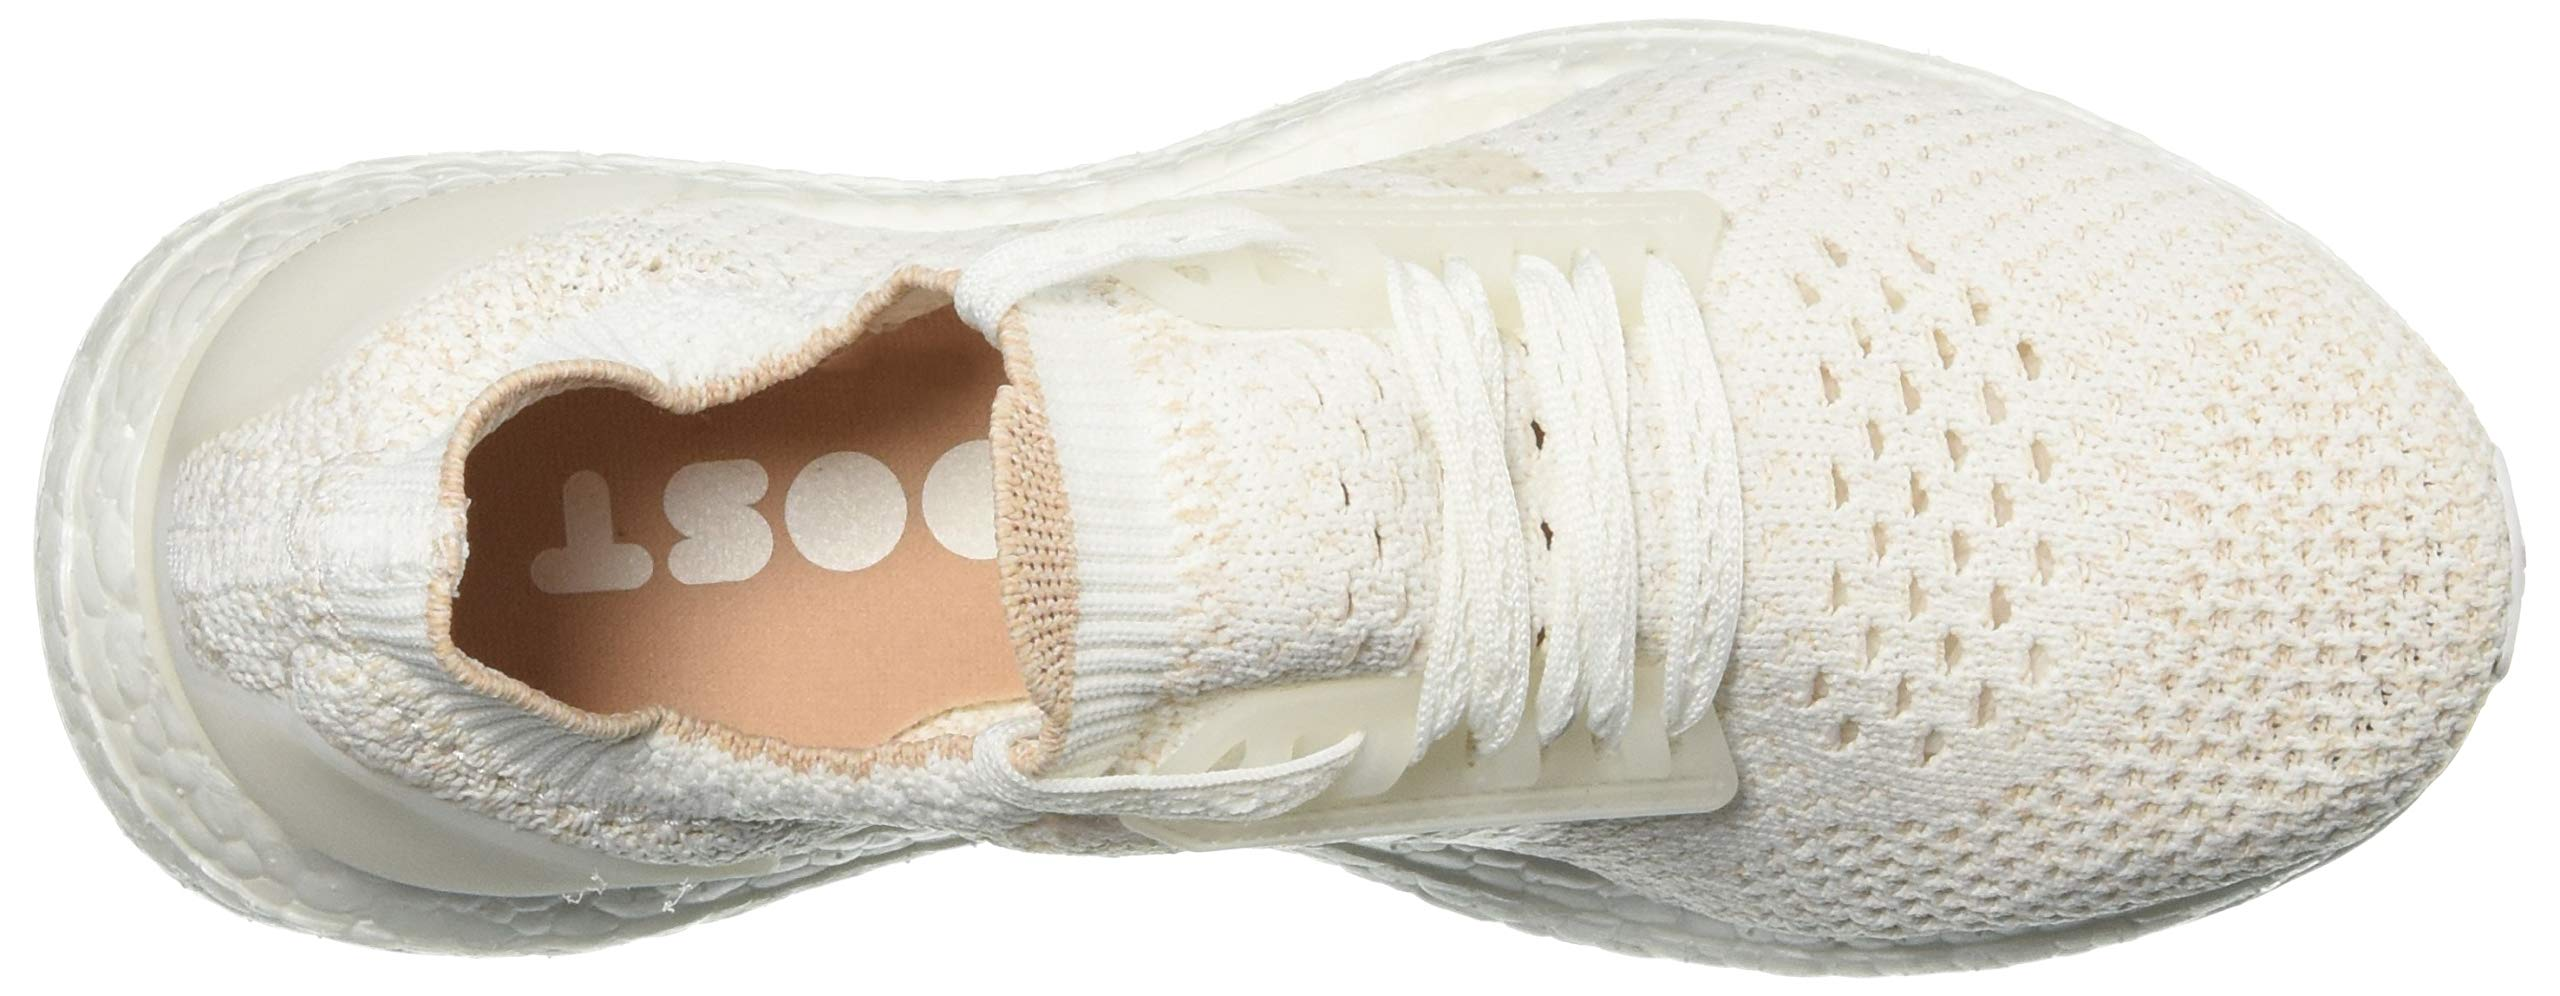 71CGwQsN4%2BL - adidas Ultraboost X Clima, Women's Ultraboost X Clima